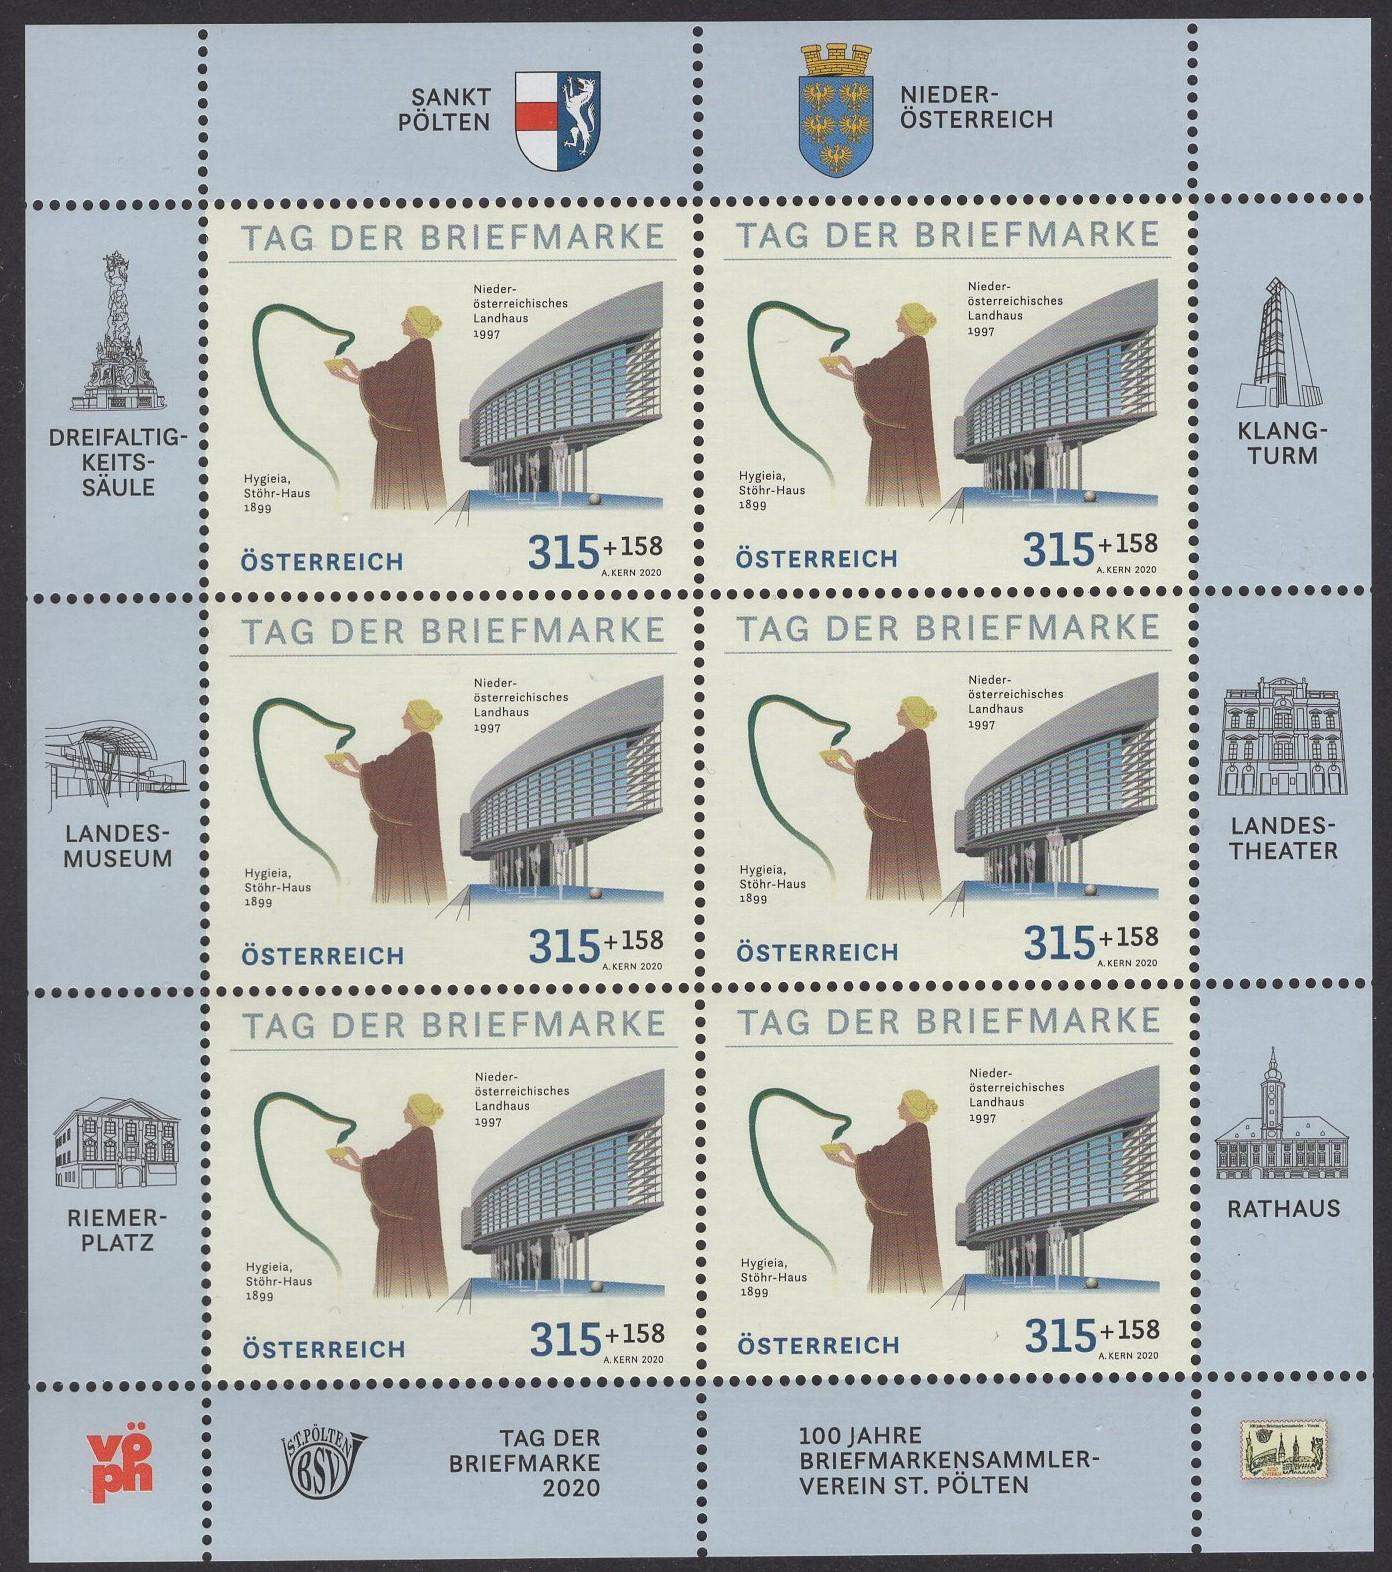 Österr KLBG Tag der Briefmarke 2020 Michel-Nr 3558